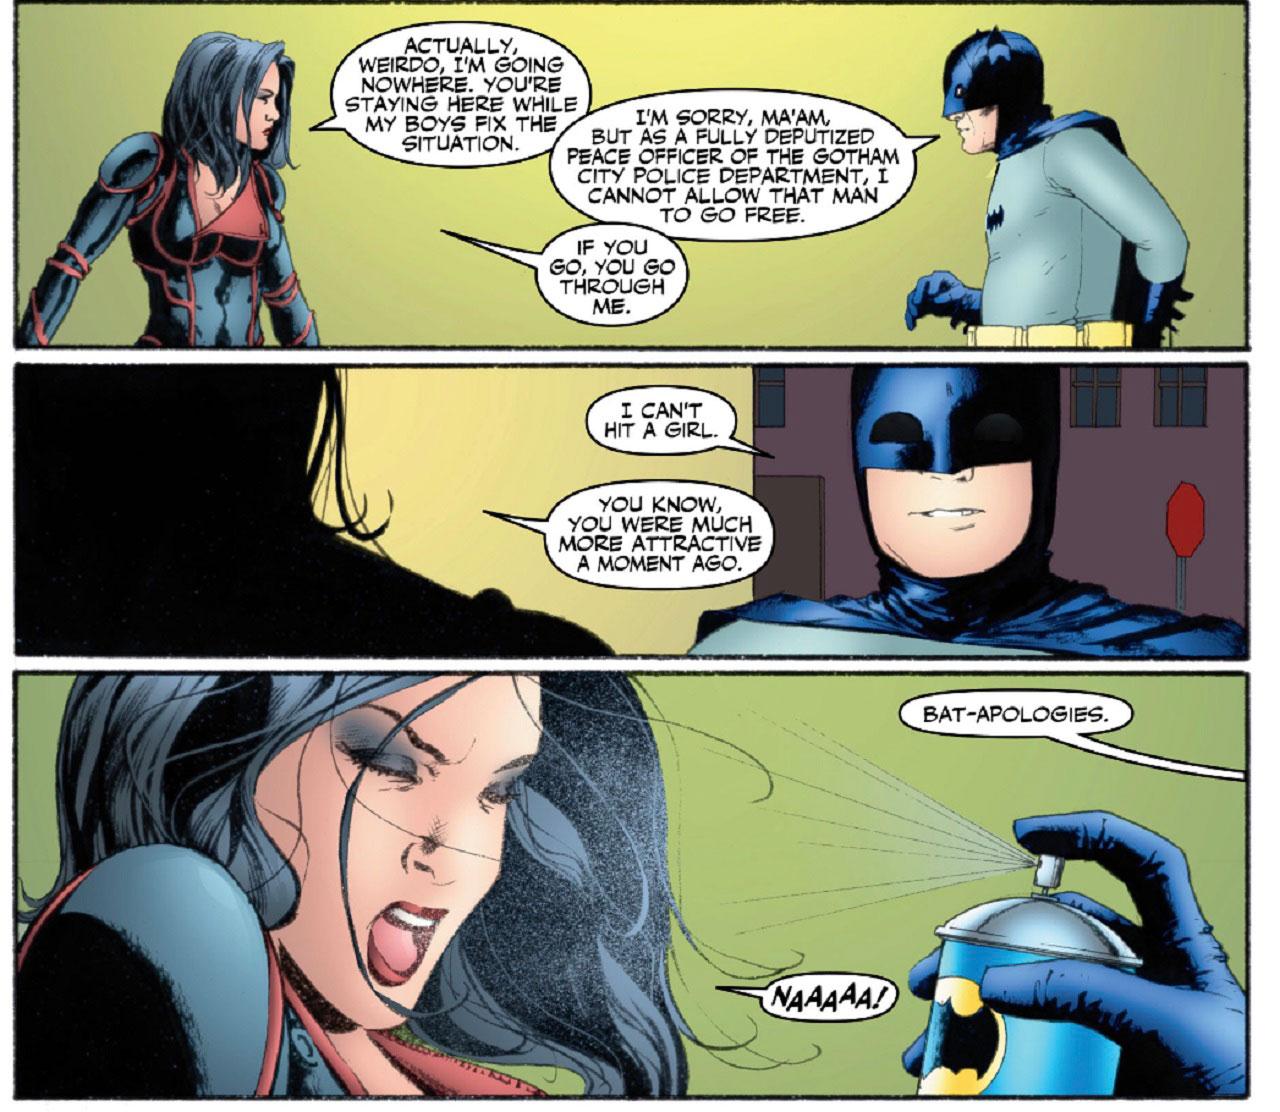 batman-female-villain-repellent-spray.jpg